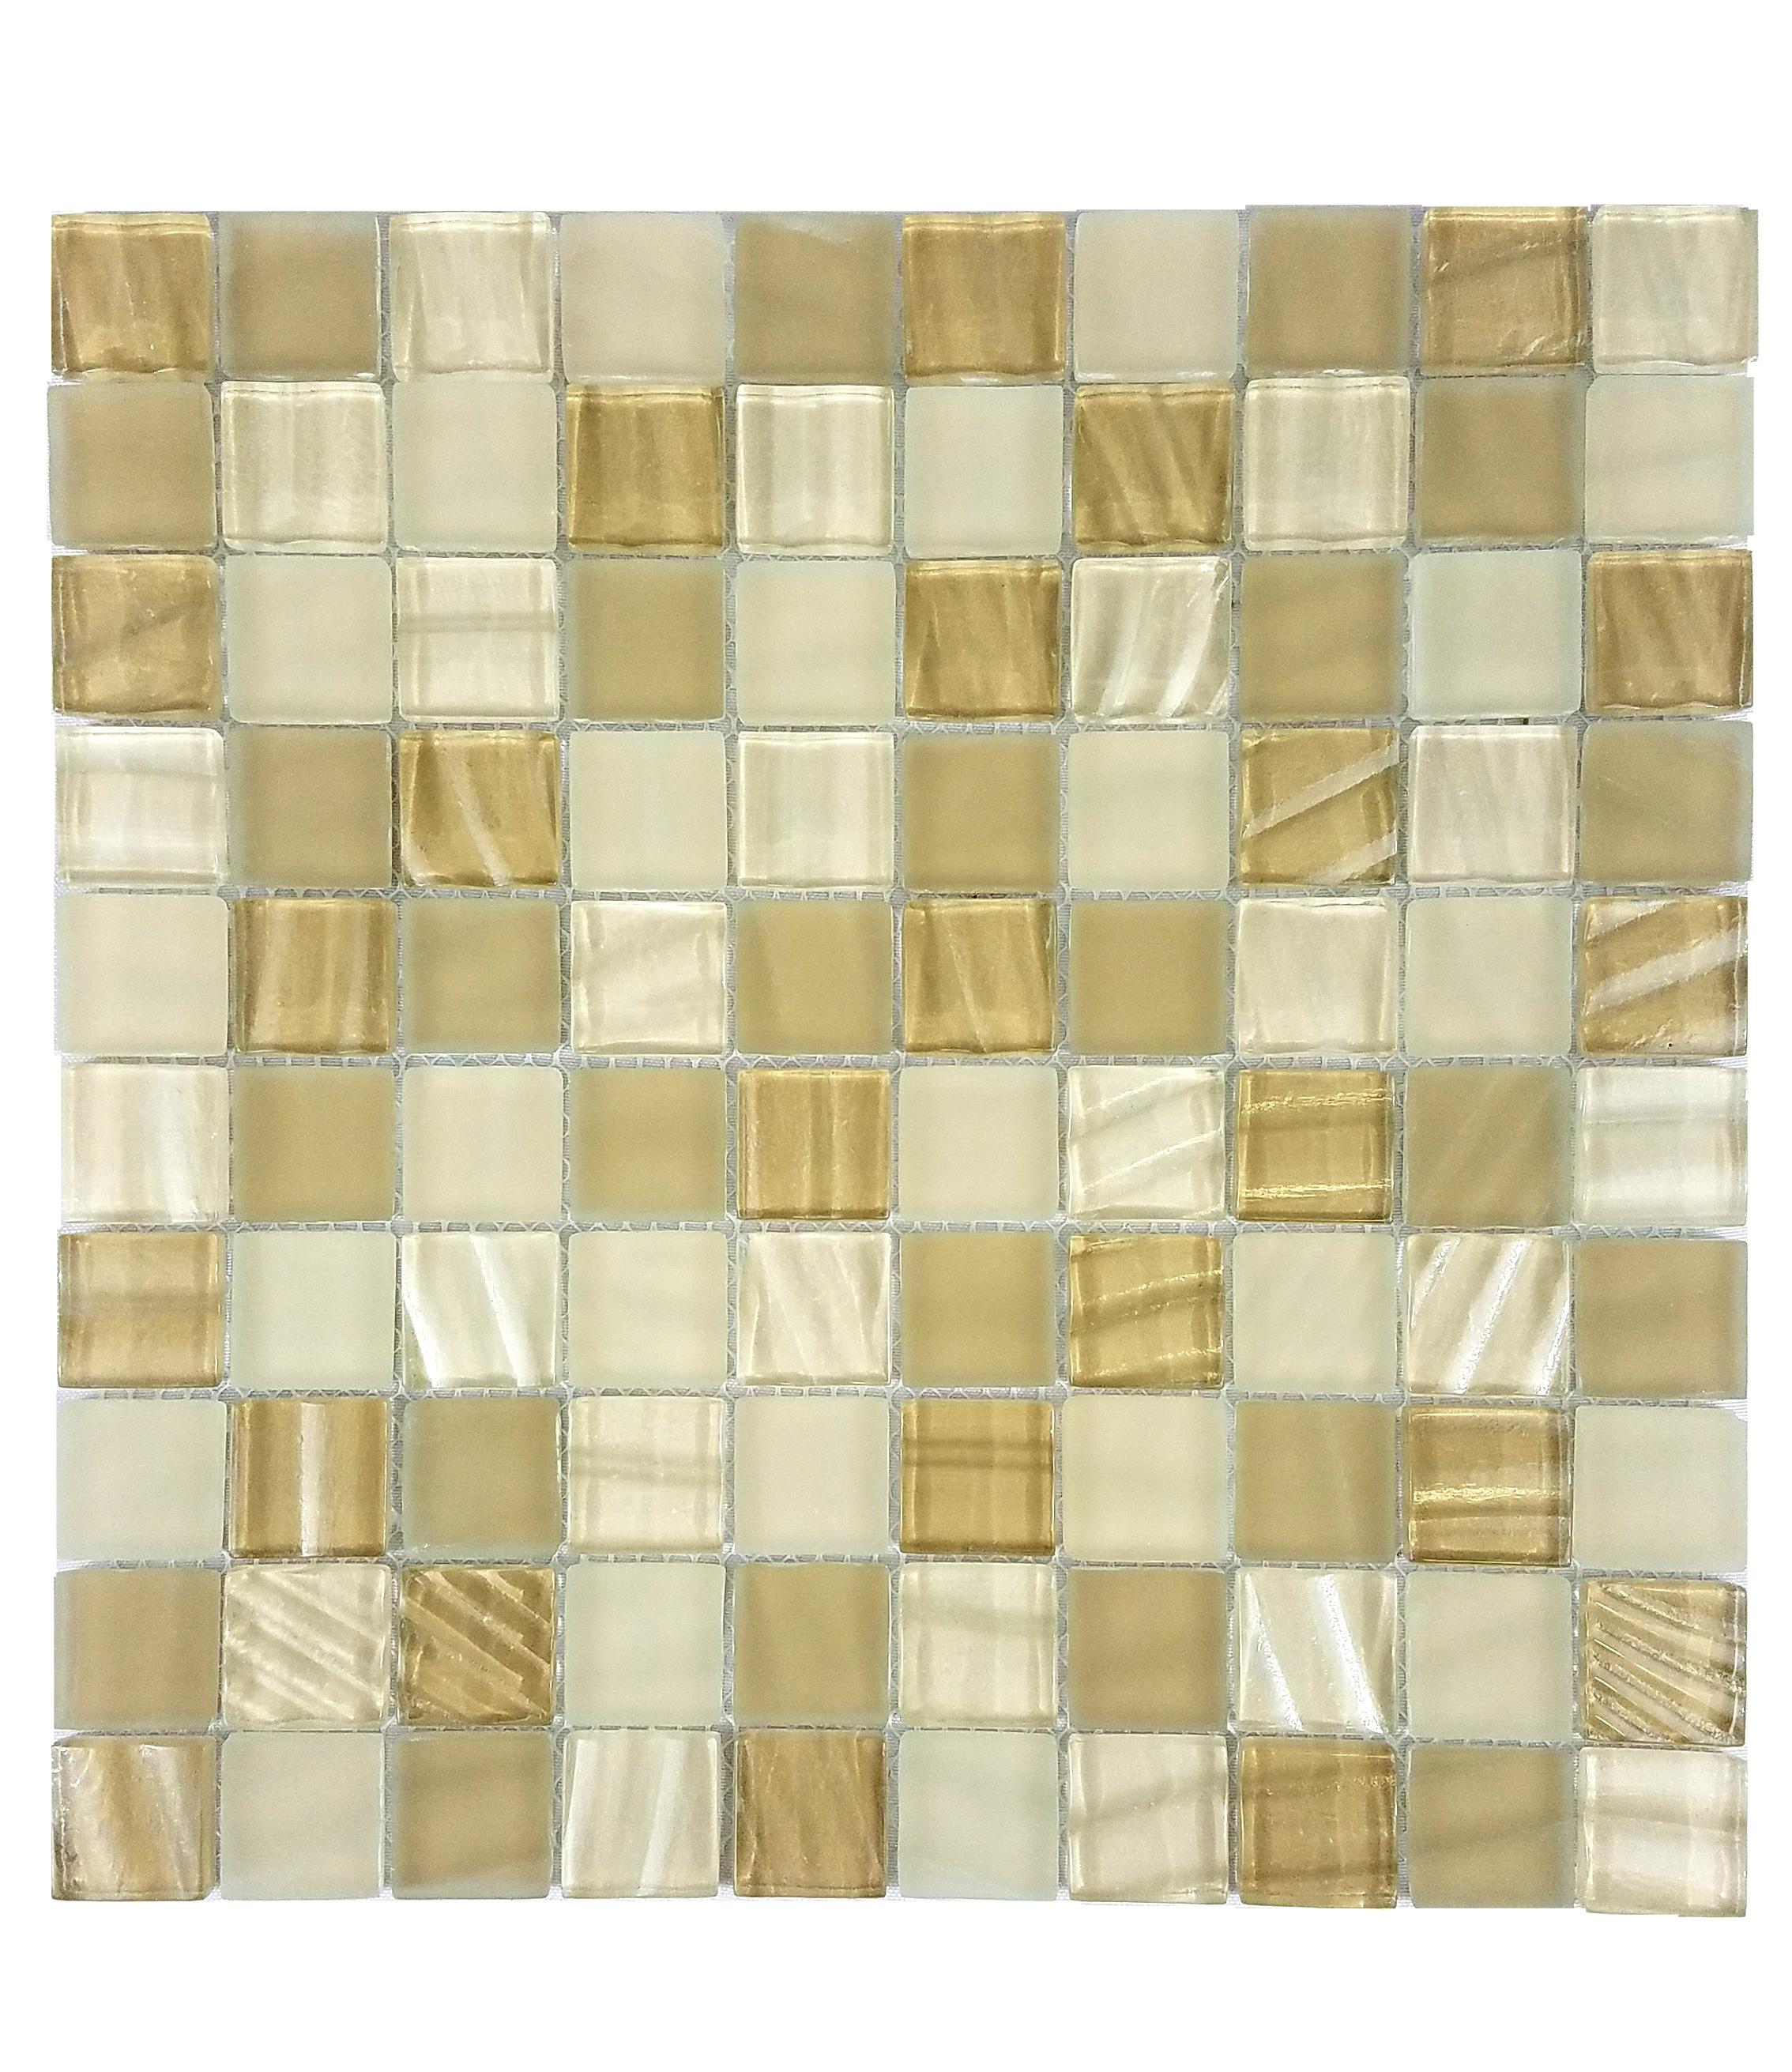 "New Era 1"" x 1"" Glossy Beige Glass Square Backsplash Mosaic Wall & Floor Tile"